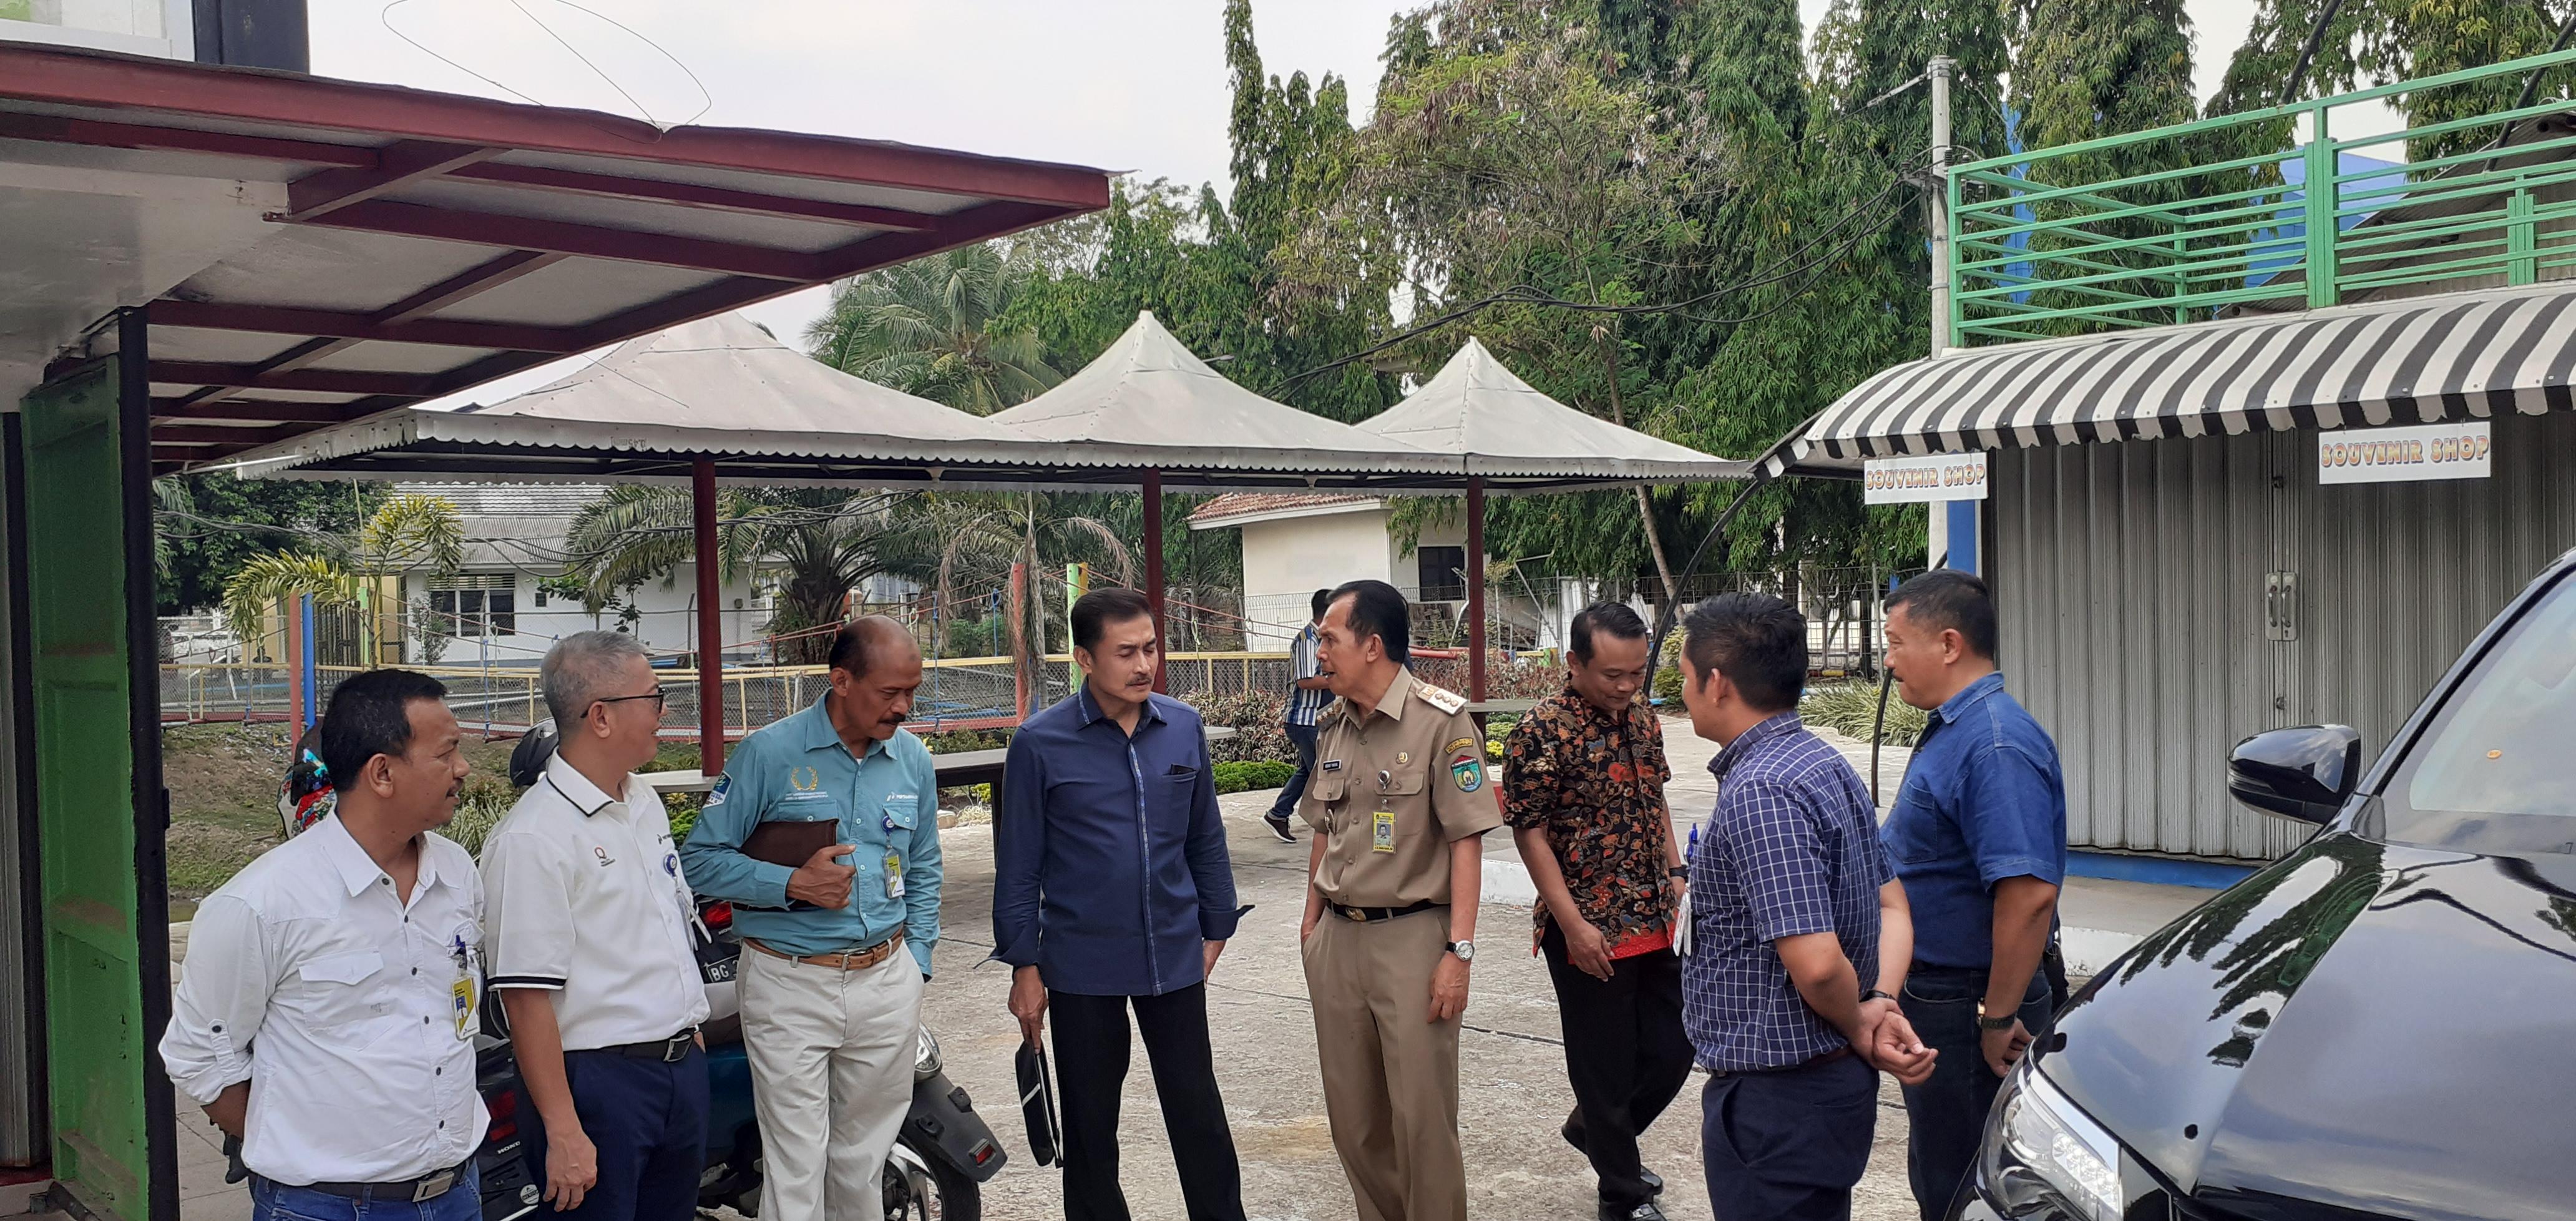 Walikota Salatiga Beserta Rombongan DiDampingi Walikota Prabumulih Berkunjung Ke Museum 3D Pertamina Asset ll